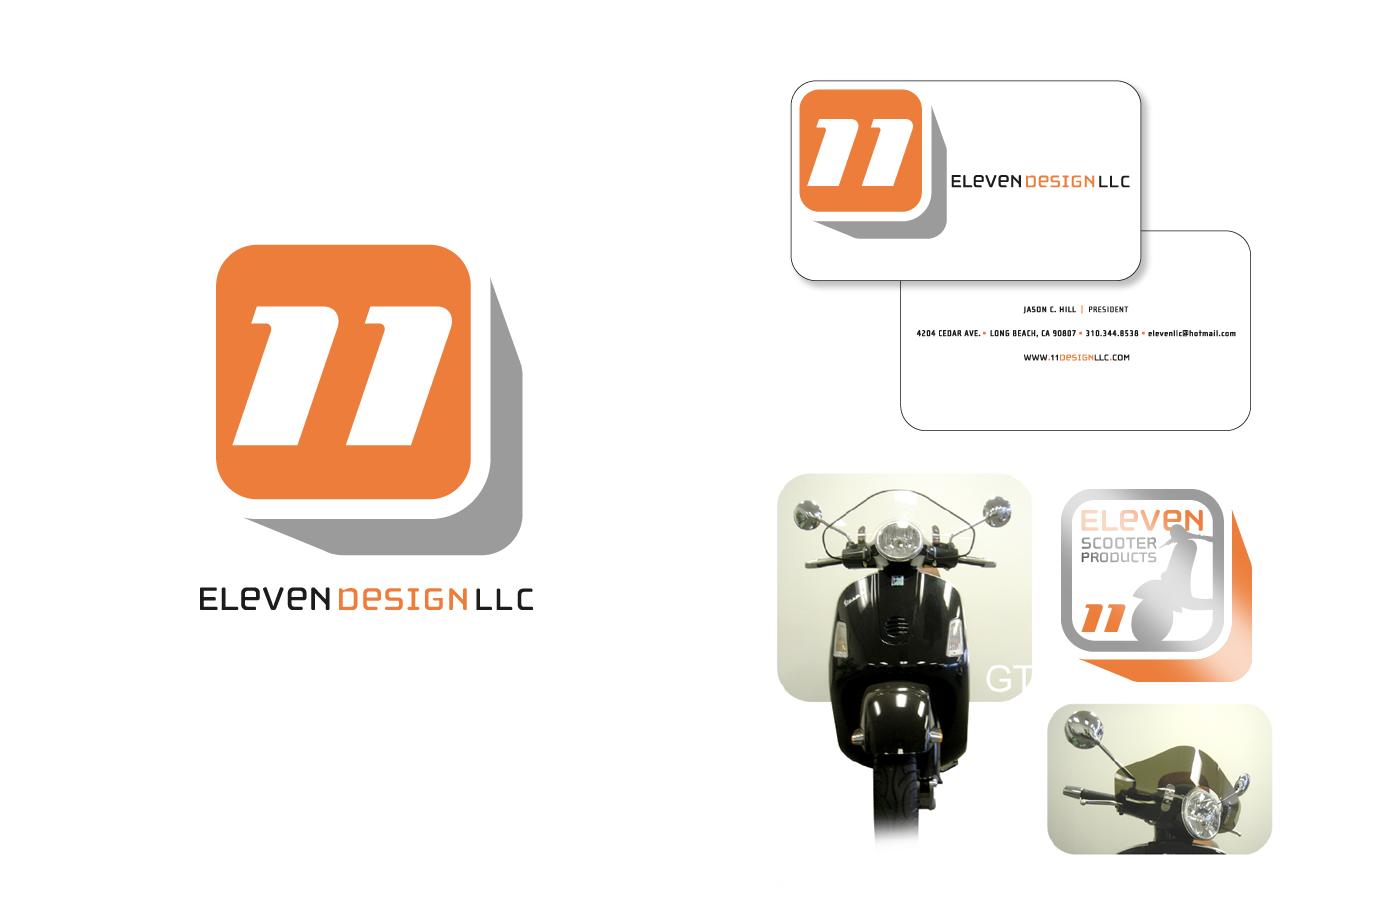 11 Design LLC.